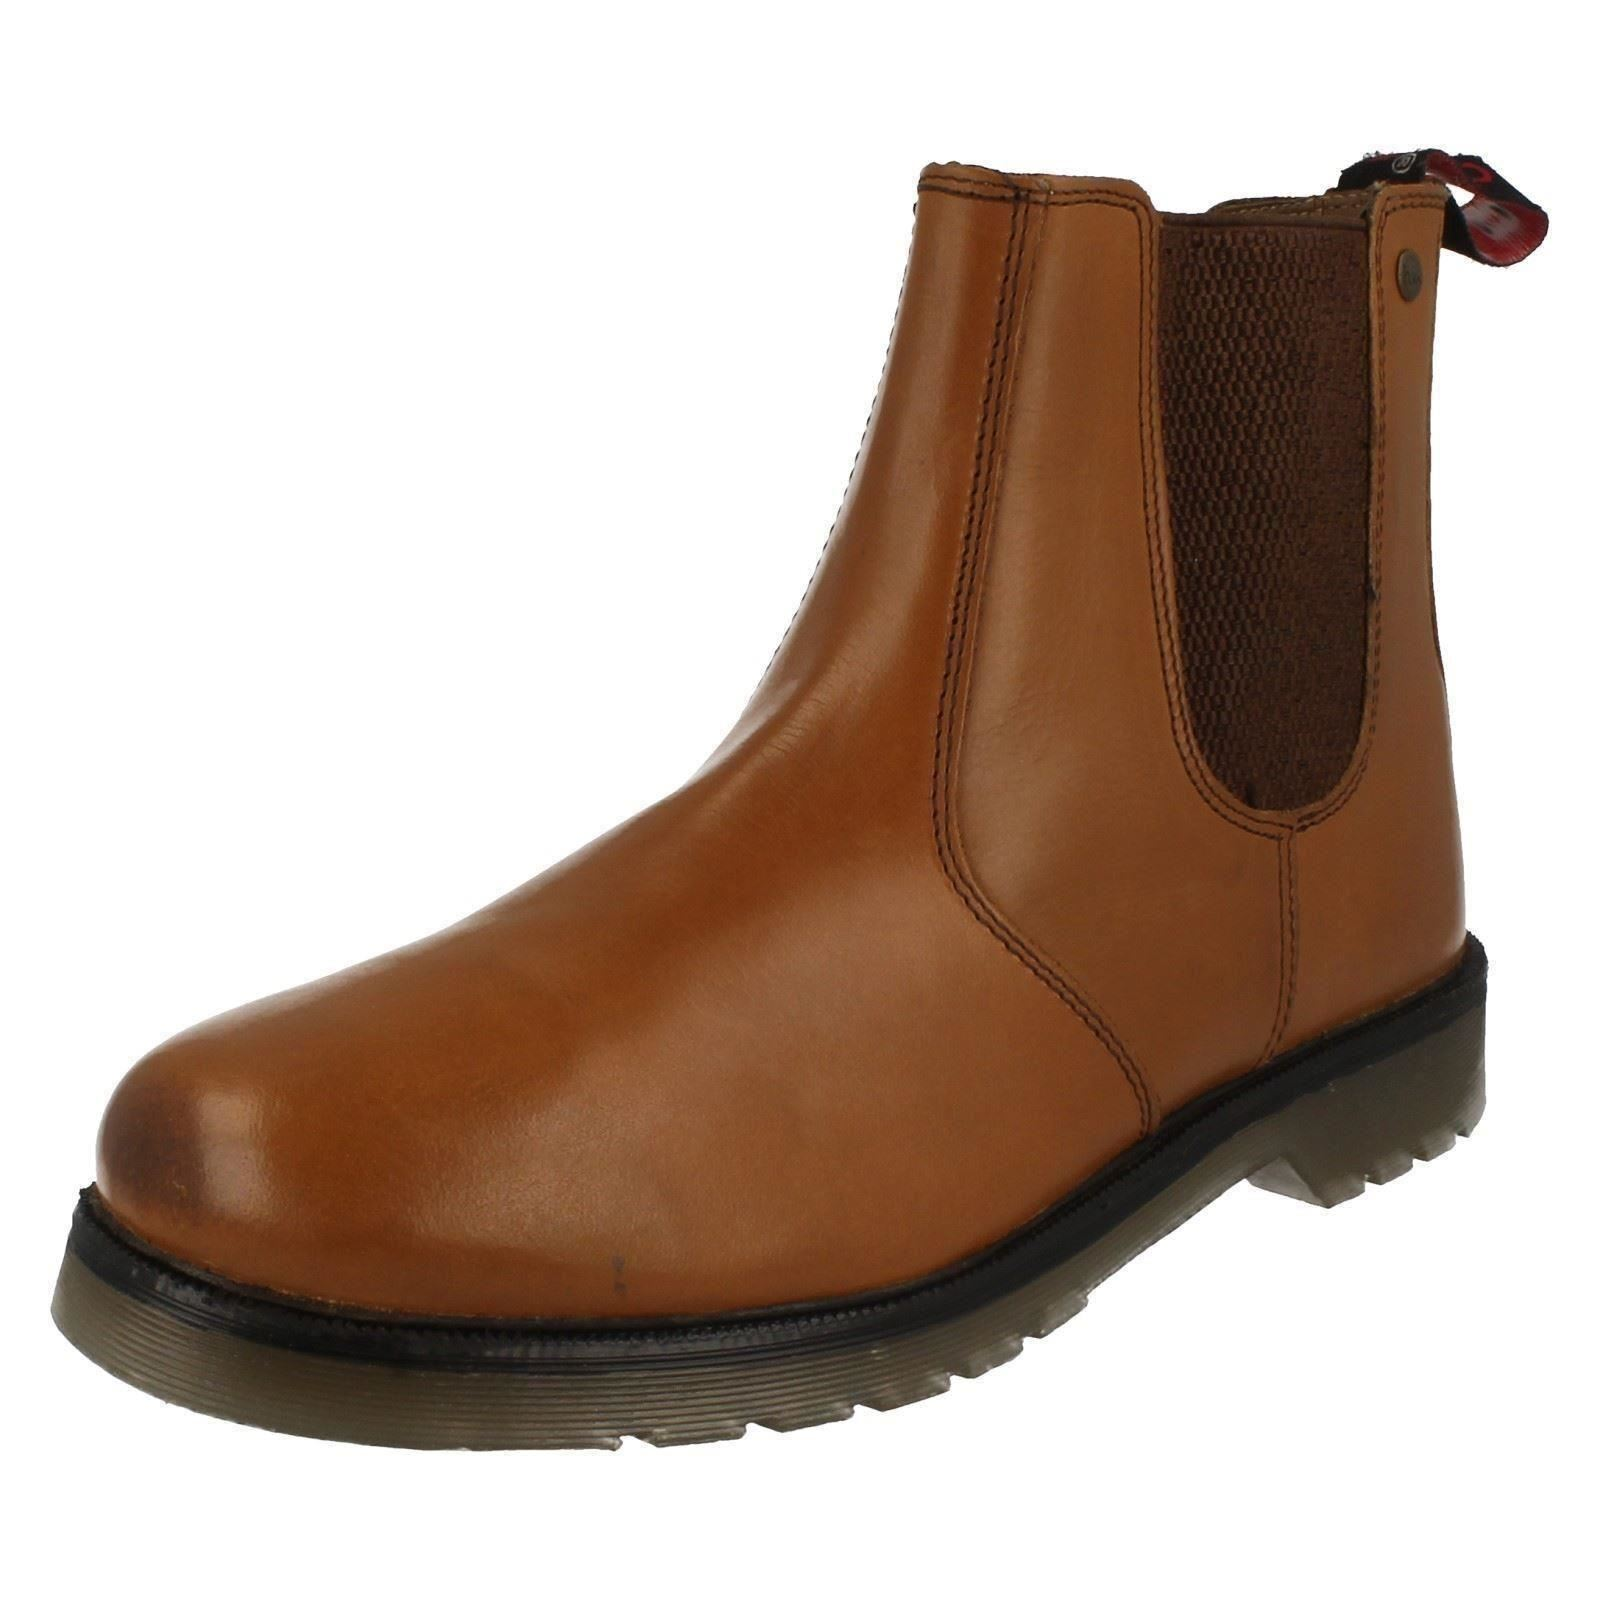 HX London 'HX01T' Mens Tan 100% Leather Chelsea Boots